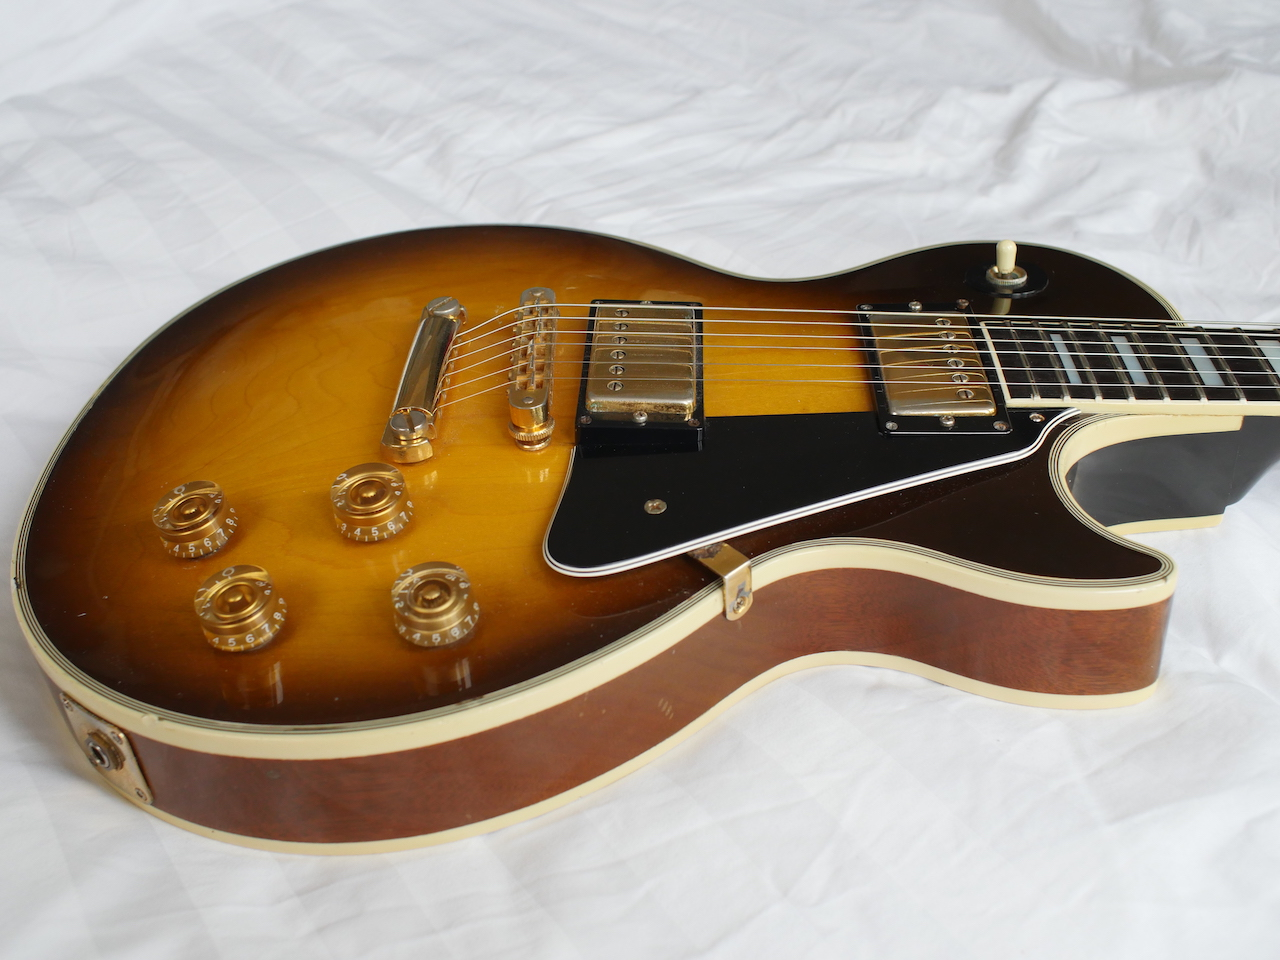 gibson les paul custom 1990 vintage sunburst guitar for sale atoyboy guitars. Black Bedroom Furniture Sets. Home Design Ideas